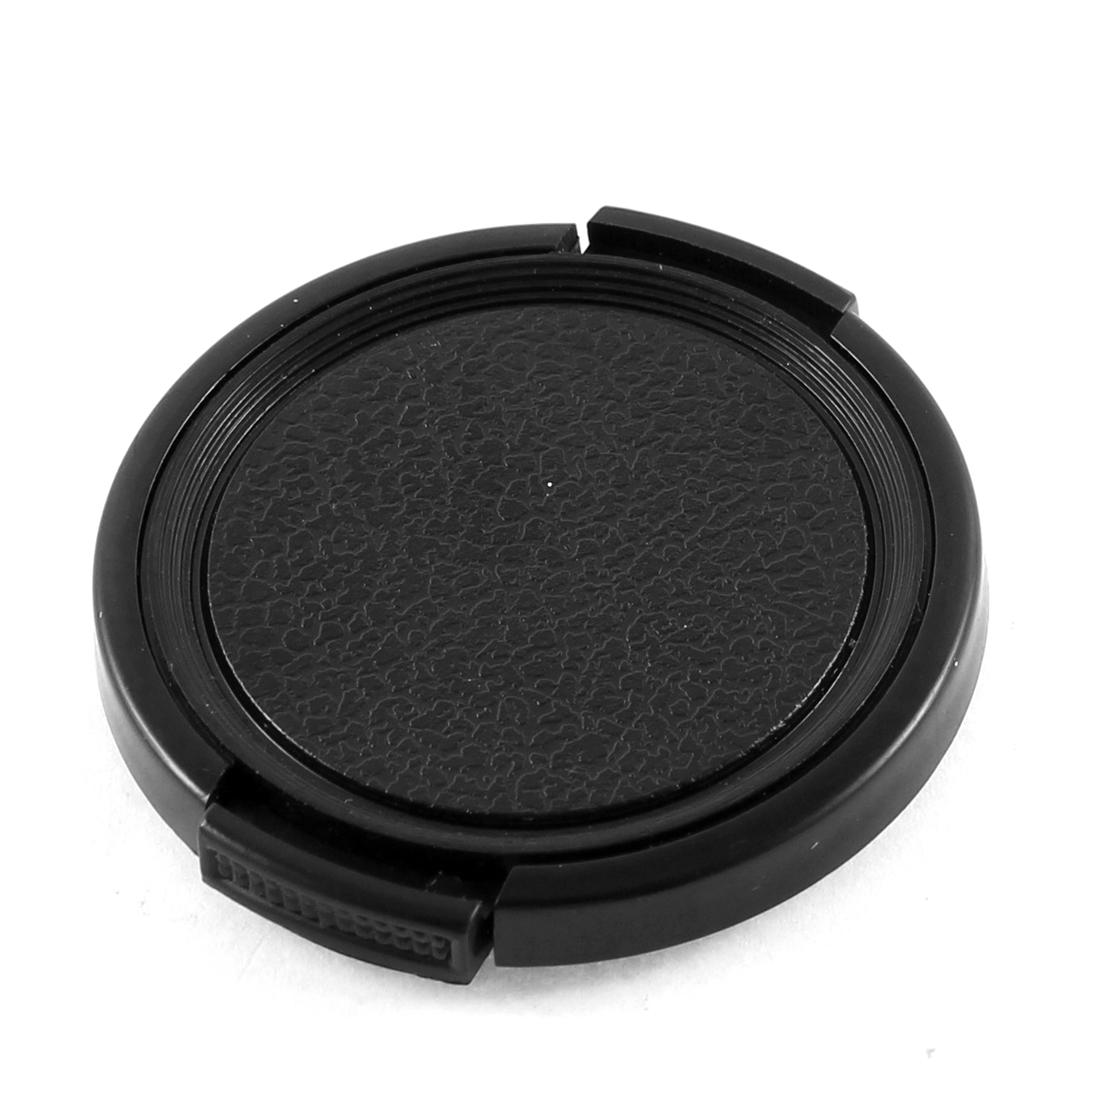 Black Front Cover Protector Camera Lens Cap 46mm Diameter